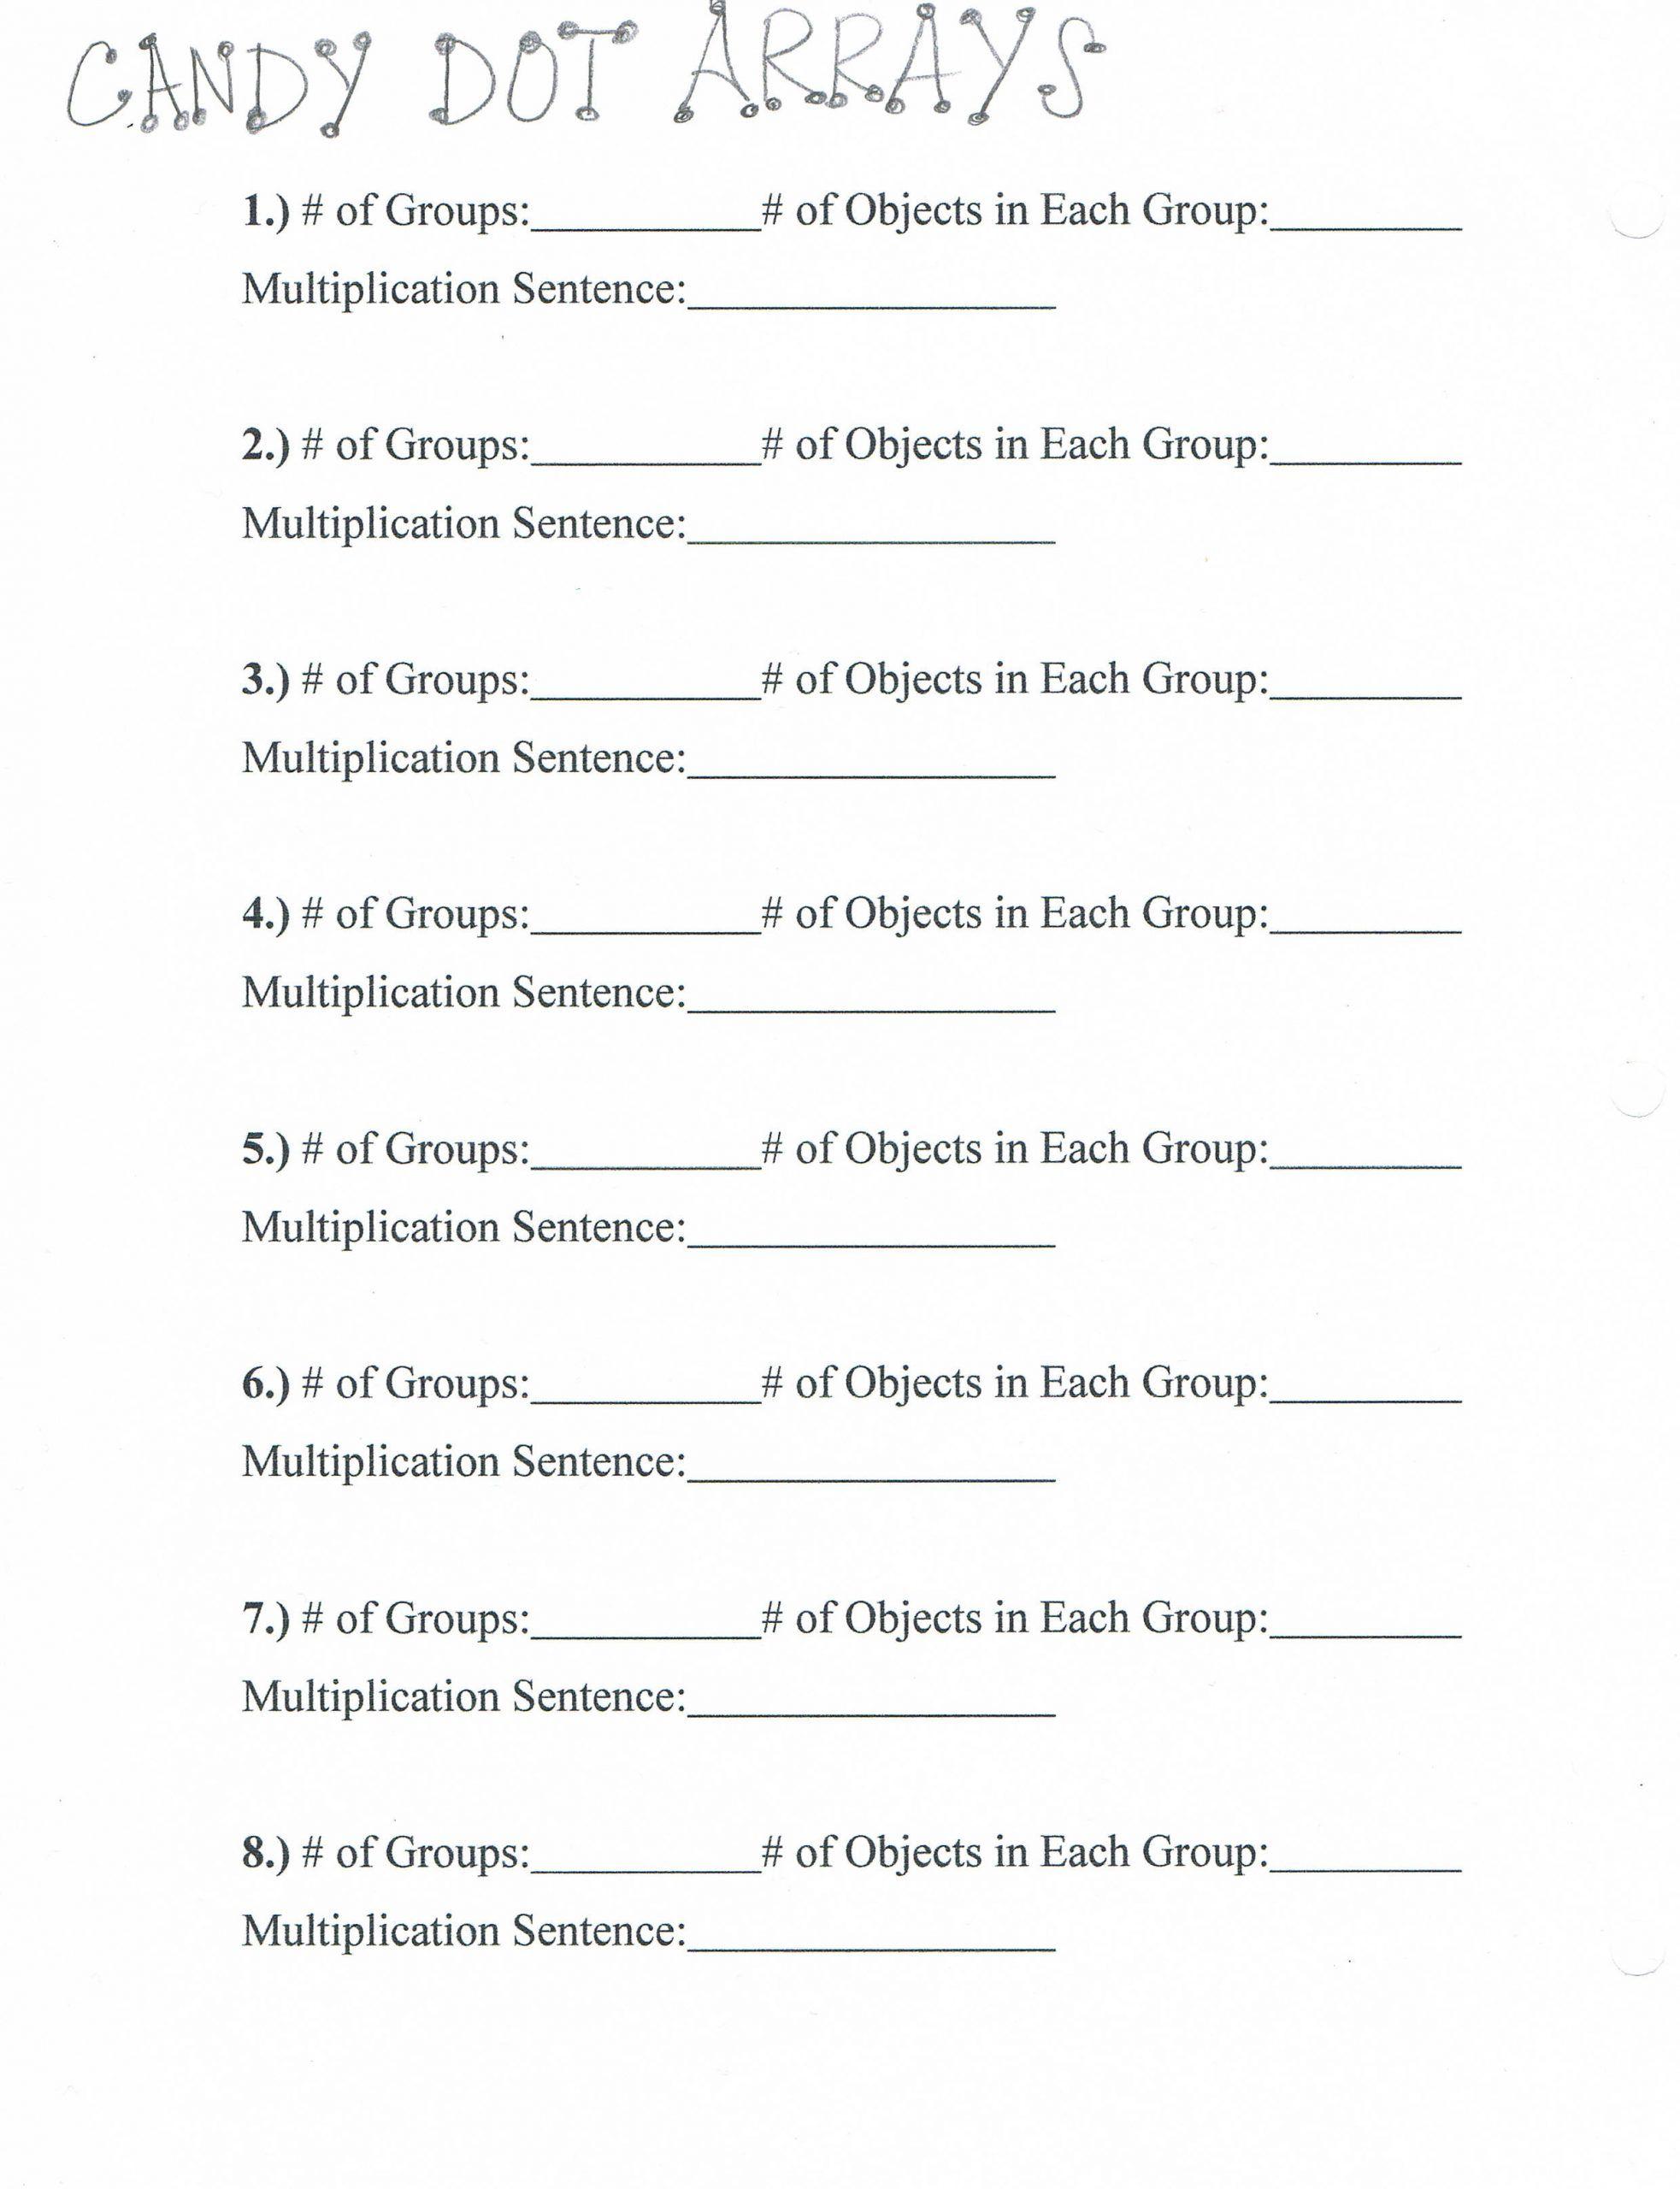 Arrays Worksheets Grade 2 In